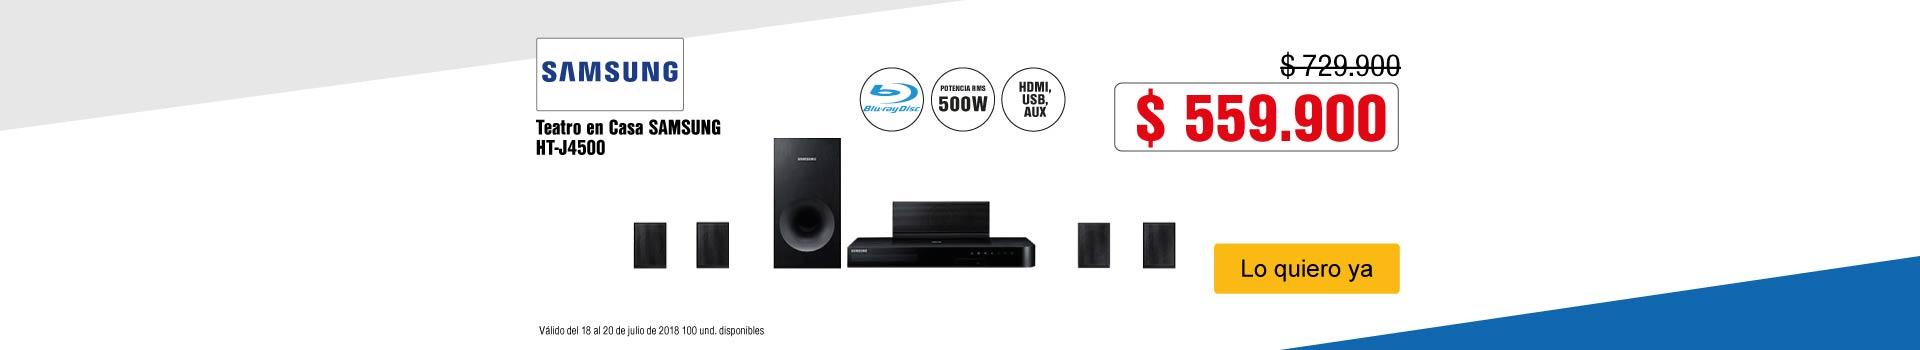 AK-KT-BCAT-4-audio-PP---Samsung-HT-J4500-Jul18